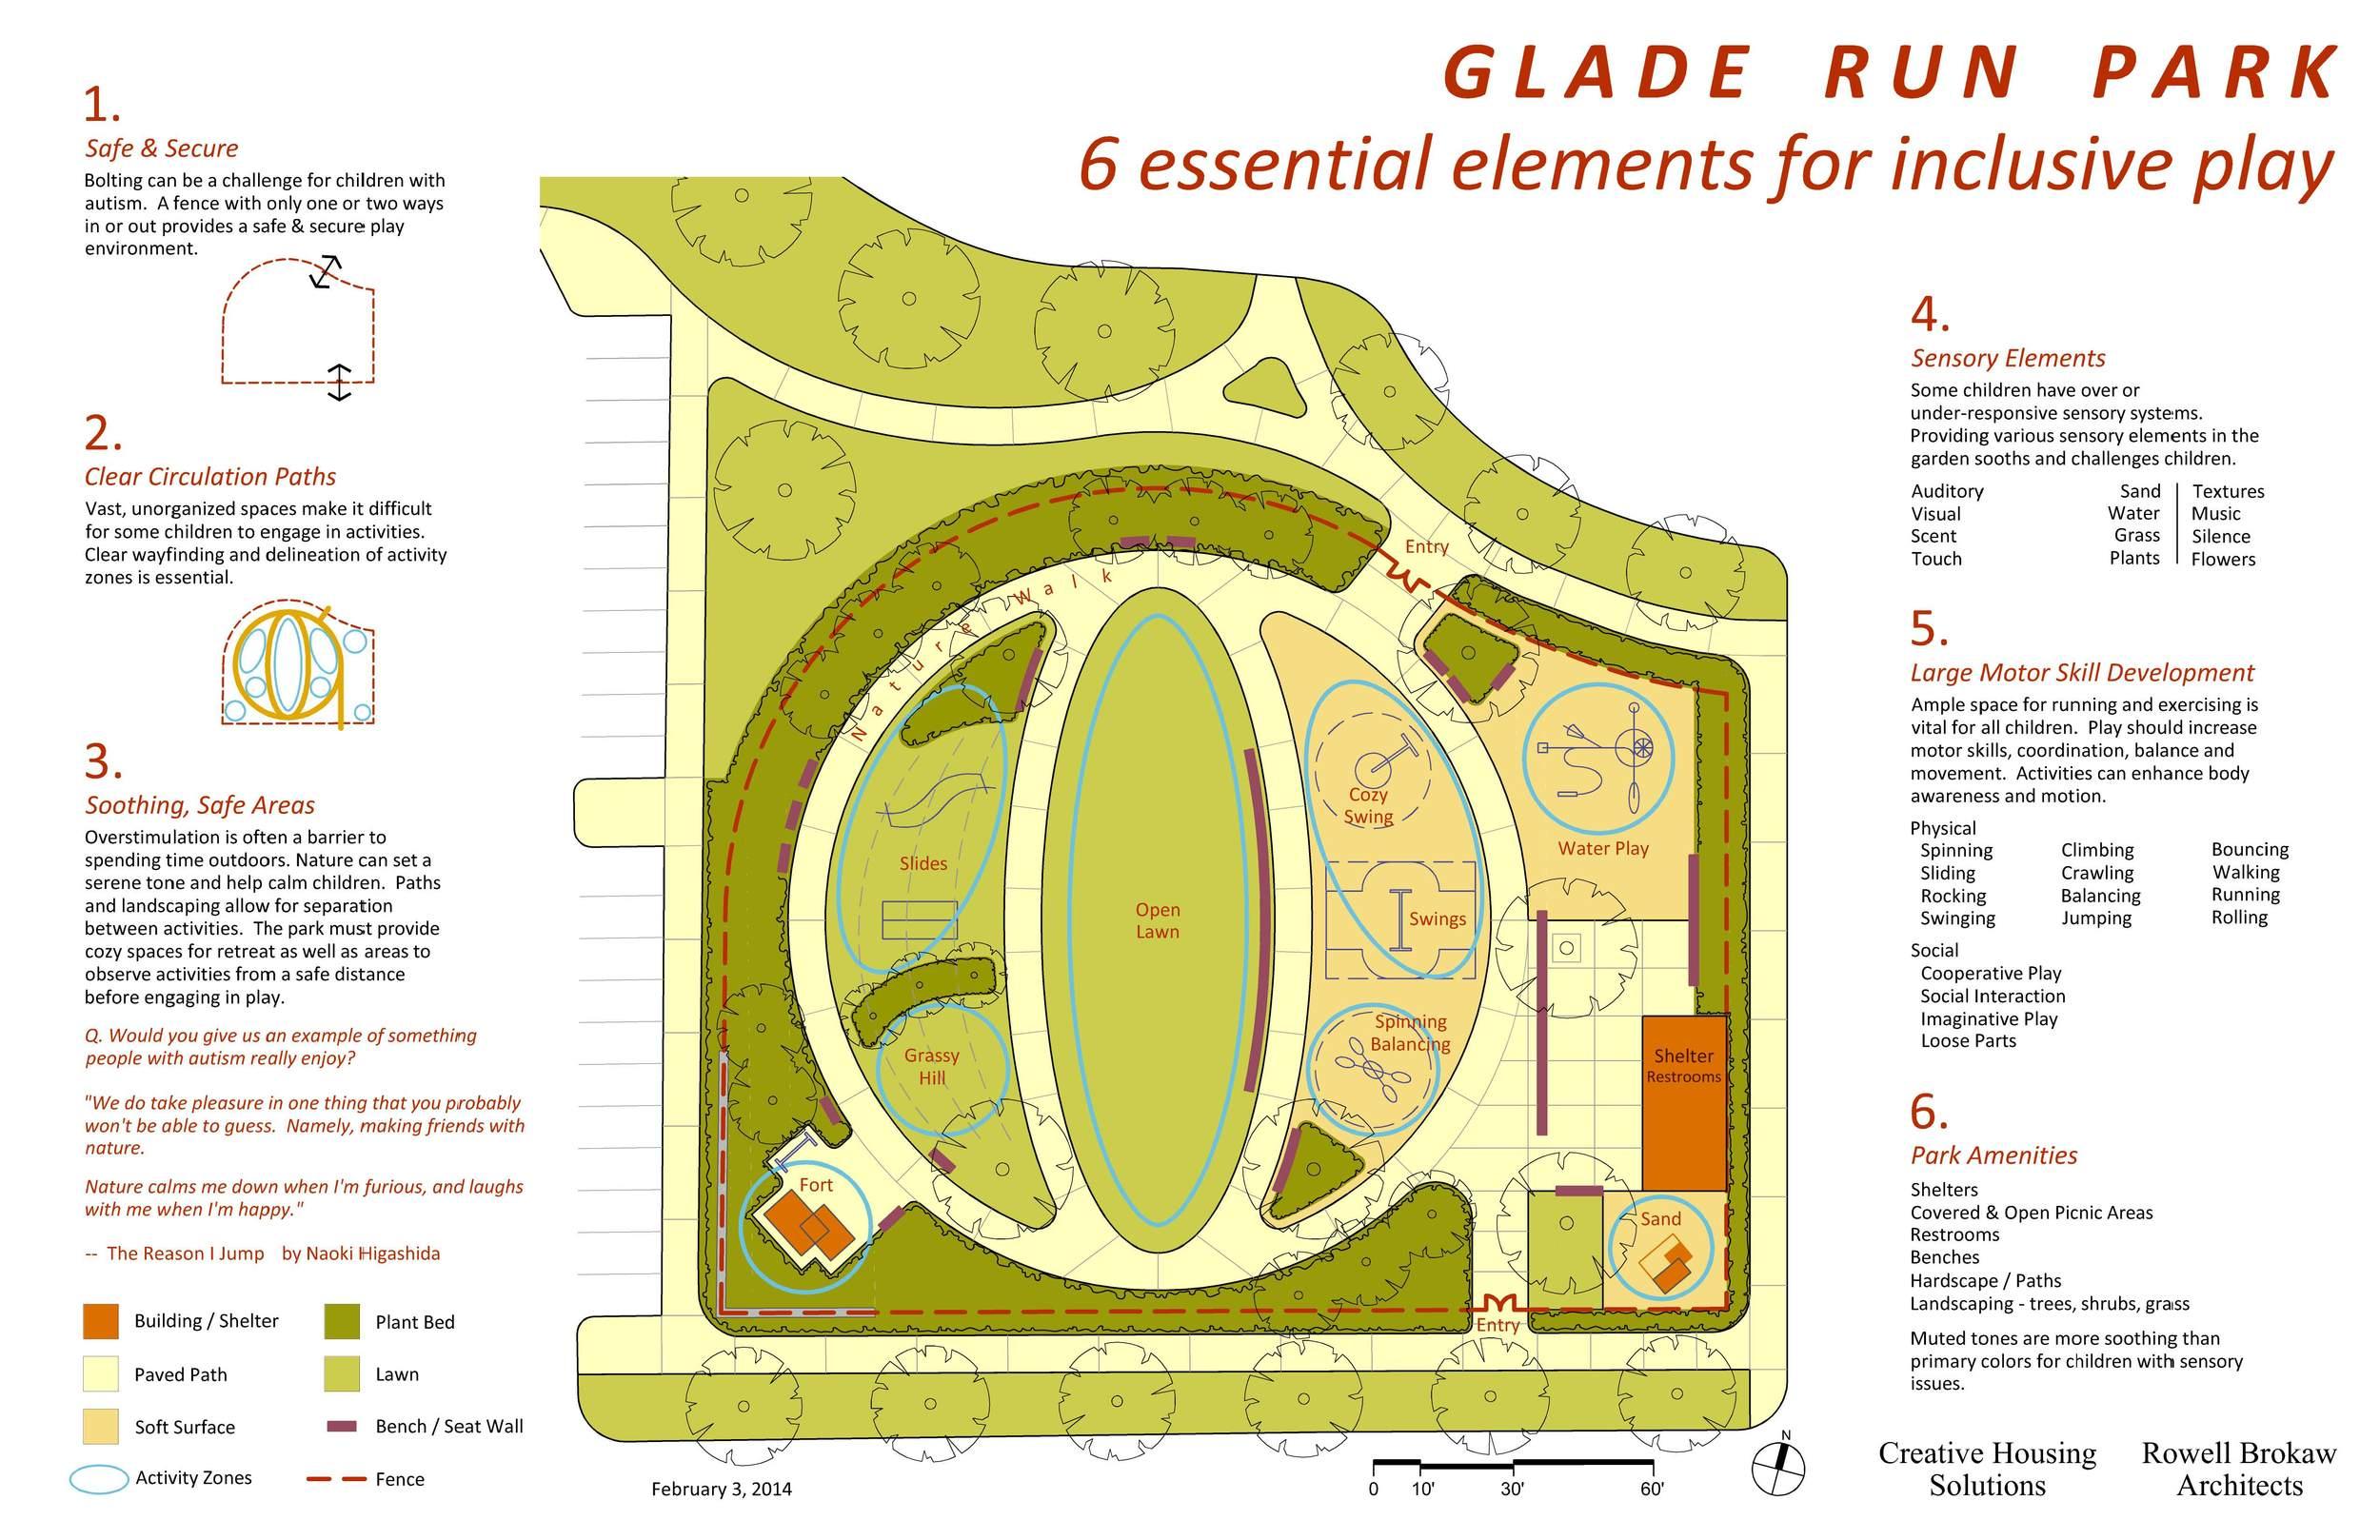 2014-02-20_Glade Run_Park Site Plan.jpg